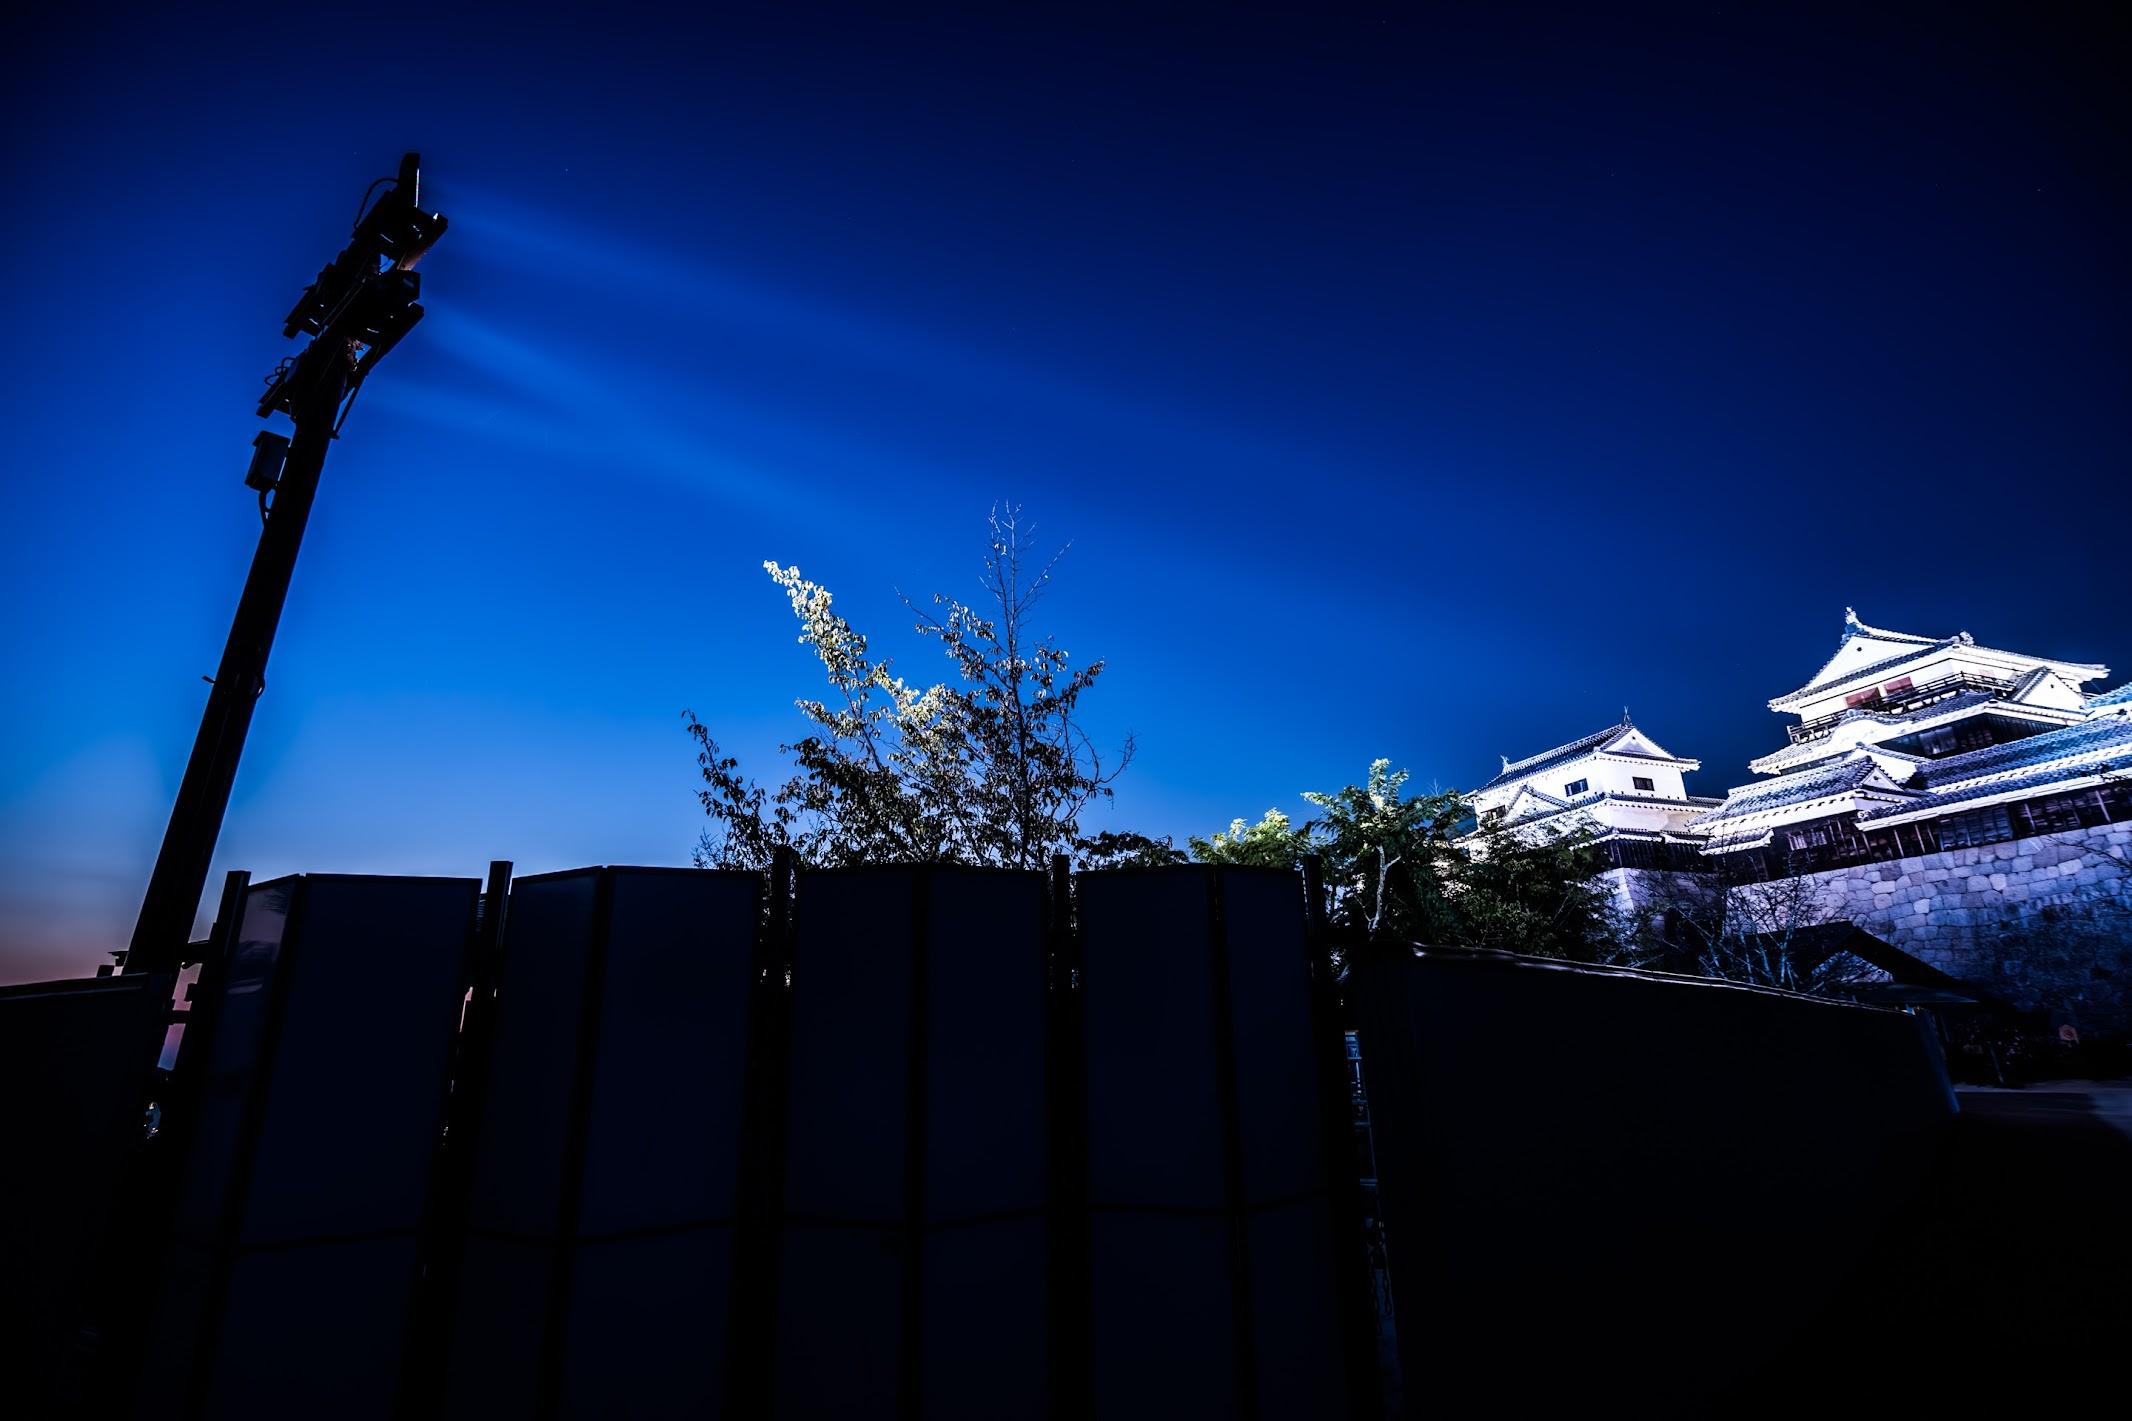 Matsuyama Castle light-up